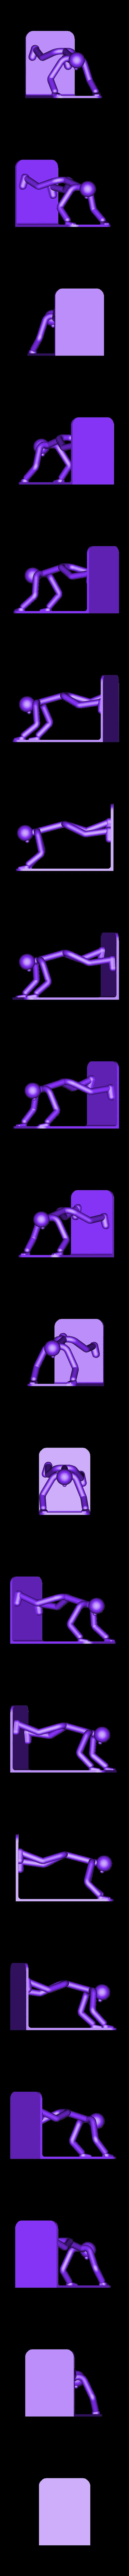 Stickman_bookend_02.STL Download free STL file Stickman Bookend • Model to 3D print, gg3d66